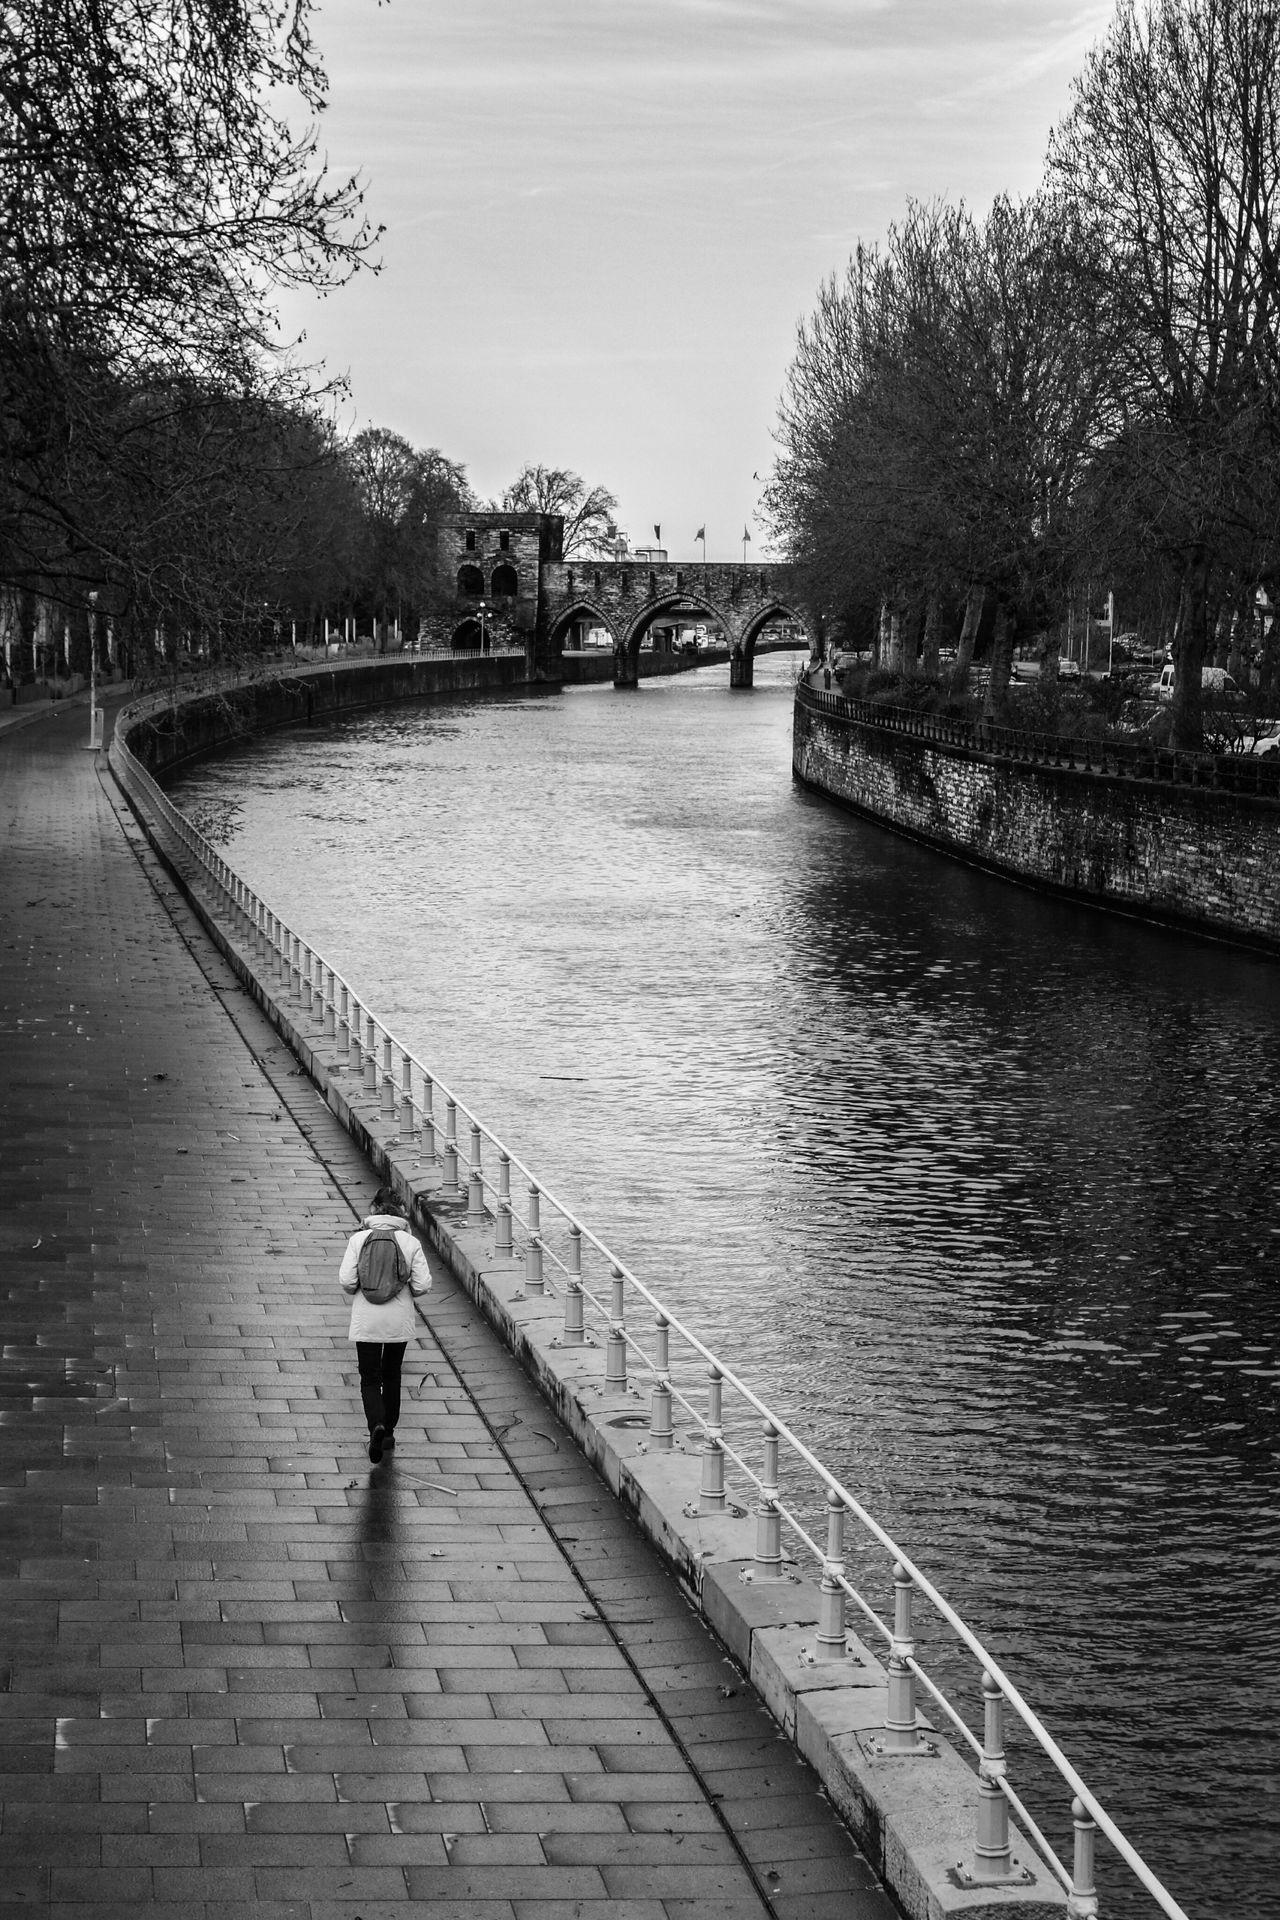 Streetphotography Belgium Tournai Blackandwhite People Sony Riverside Bridge City Walk This Way